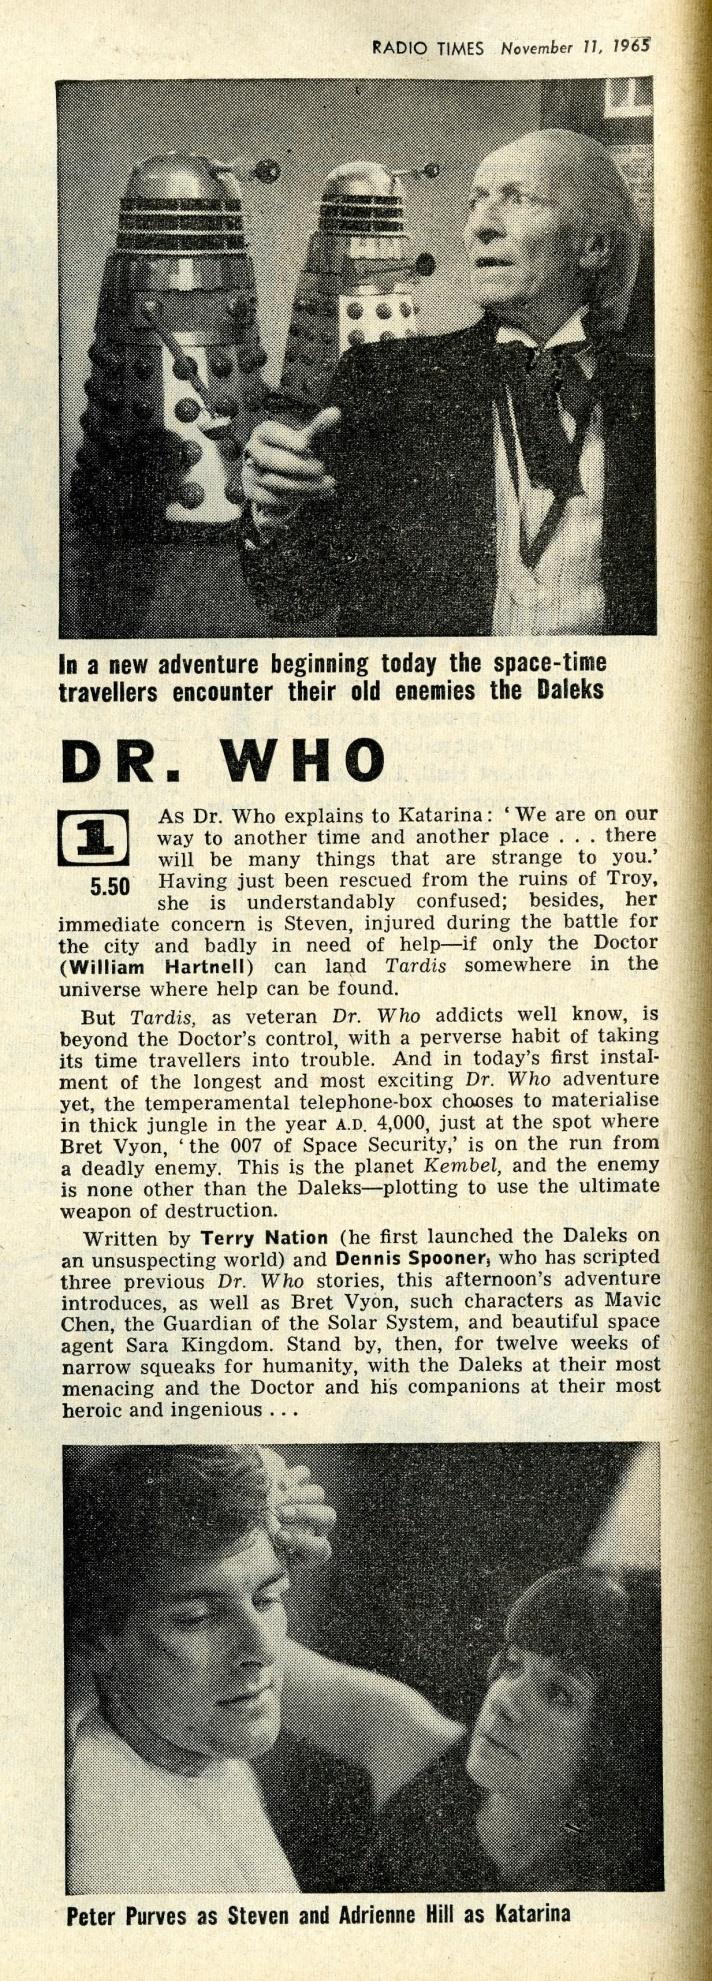 Radio Times, November 13-19, 1965